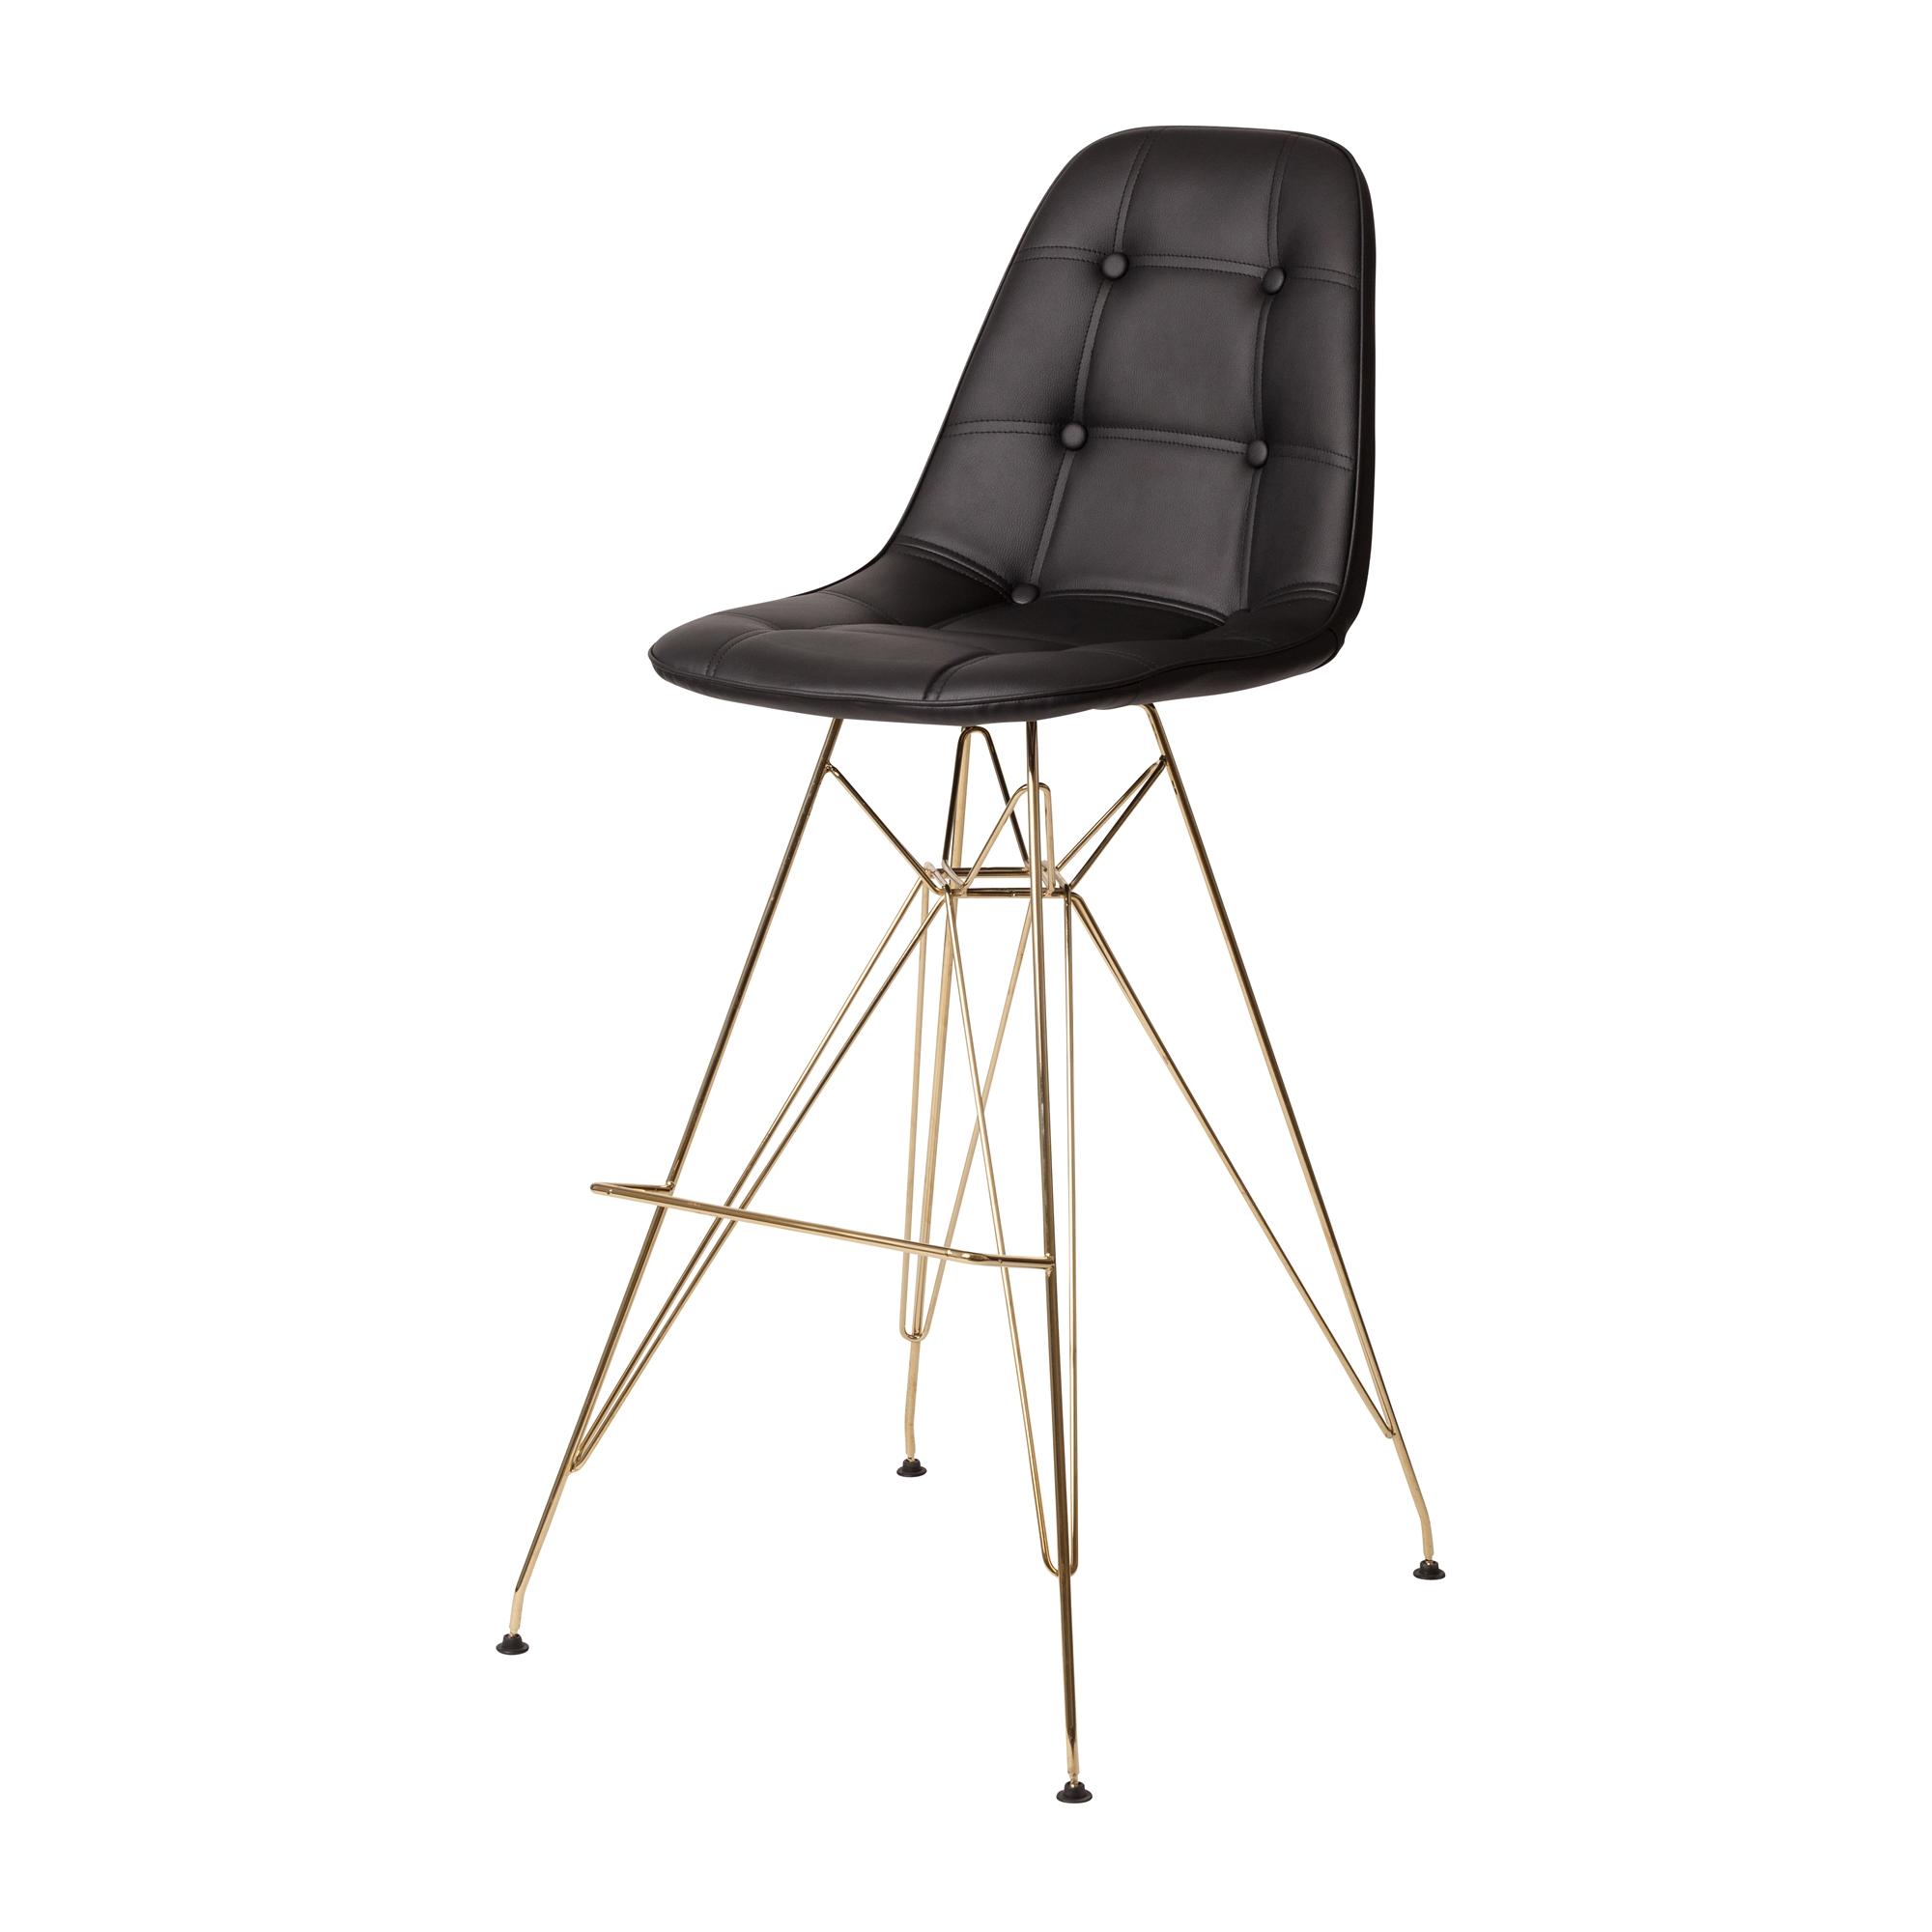 Superb Gold Finish Bar Stool In Black Leather Uwap Interior Chair Design Uwaporg